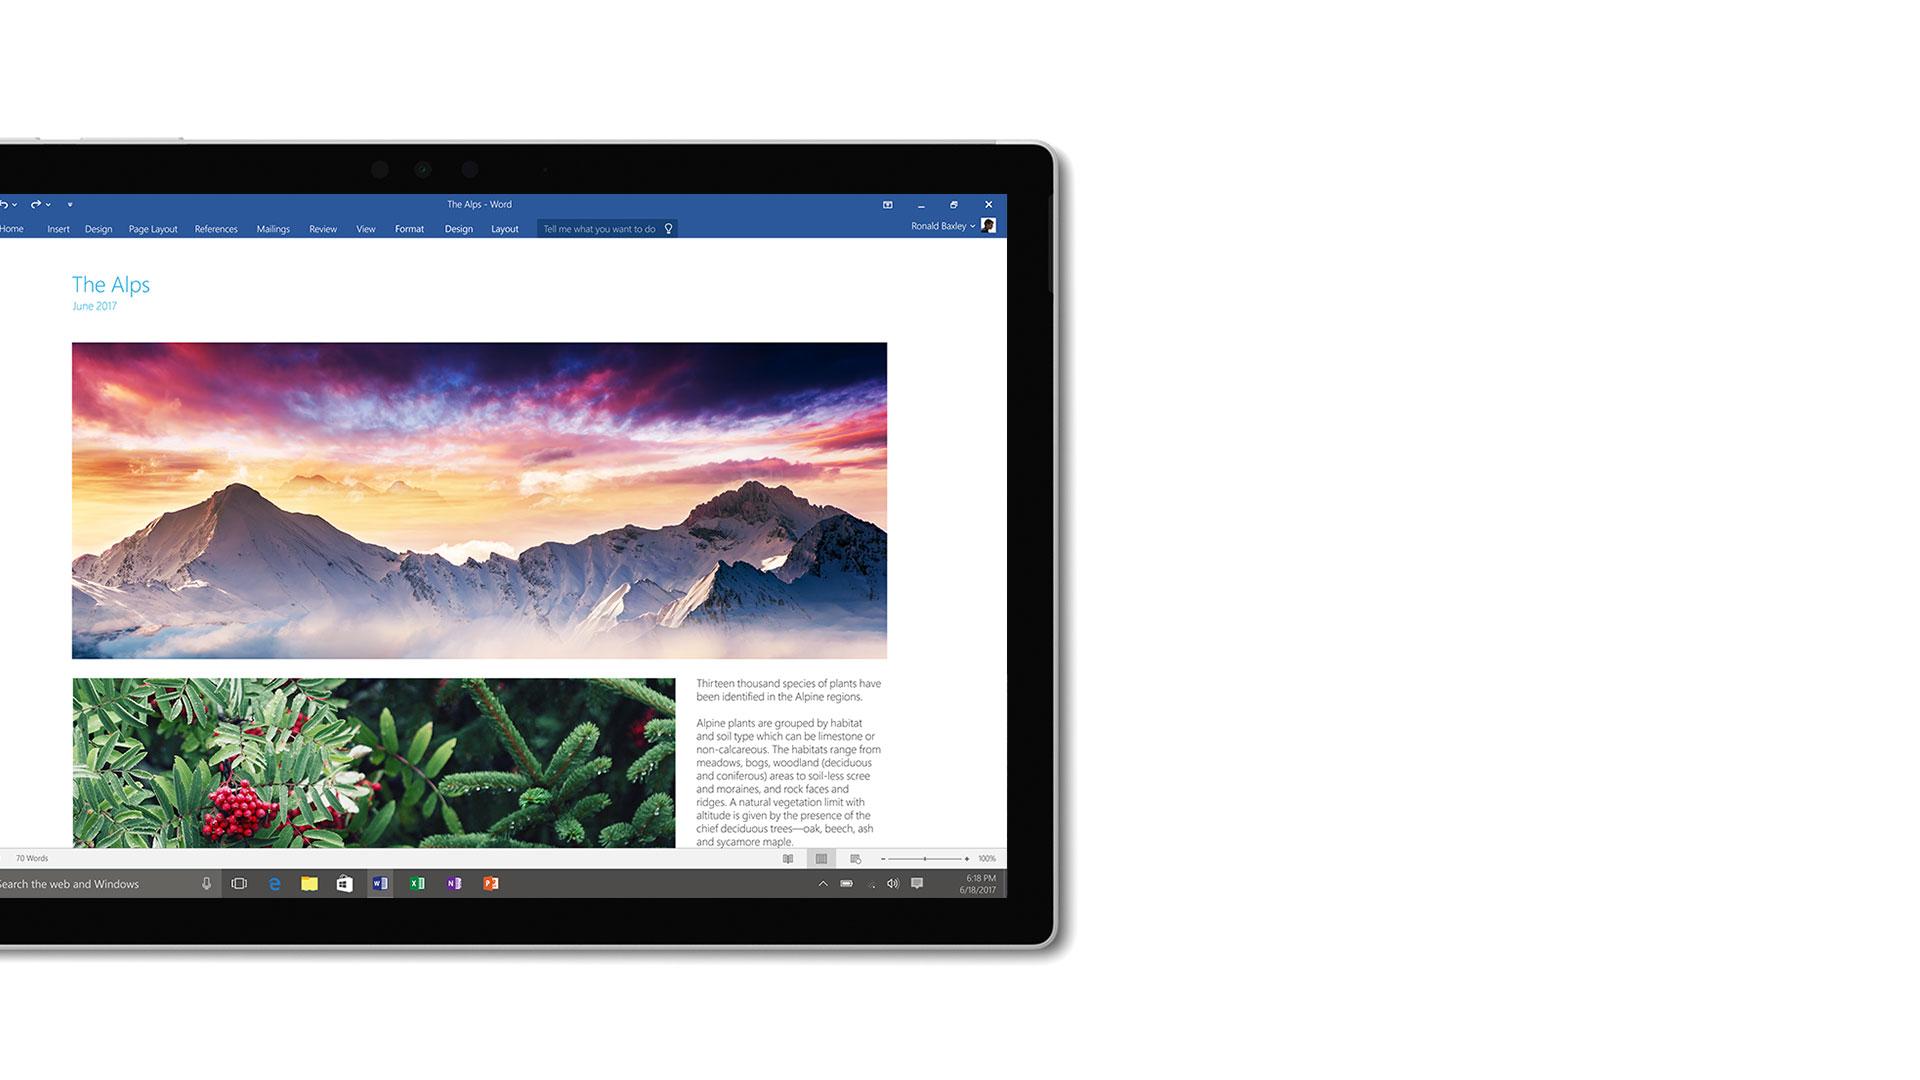 Microsoft Word 用户界面的图像